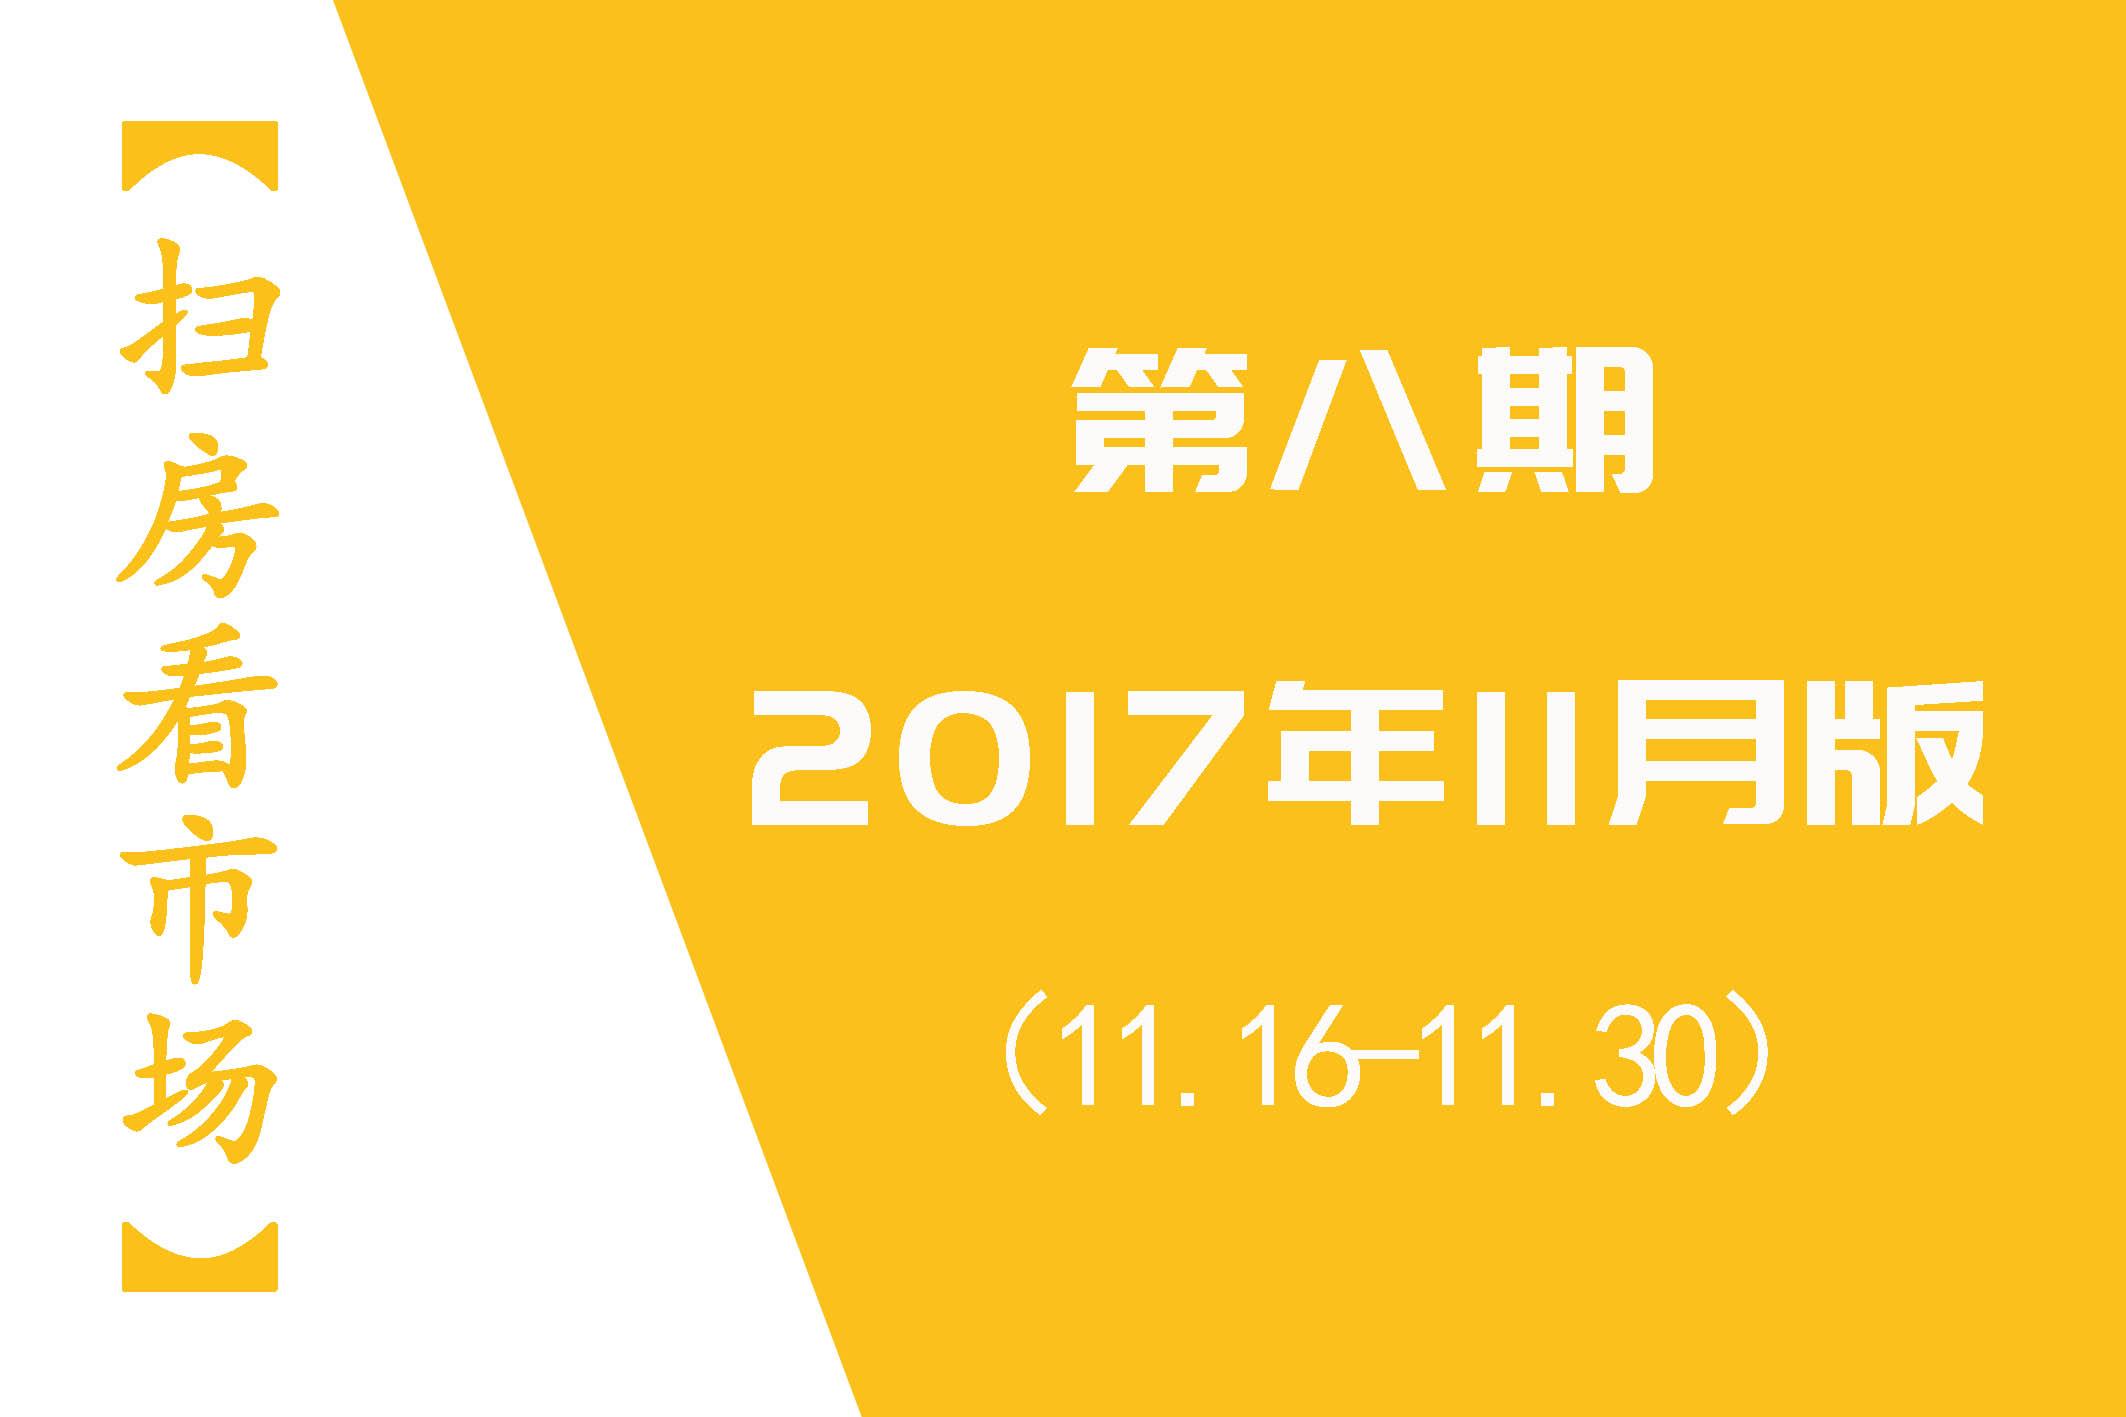 http://img.saofang.cn/new/distrib/areadelegate/12/marketing/20171206/20171206_WLcr1ItmYX.jpg_news